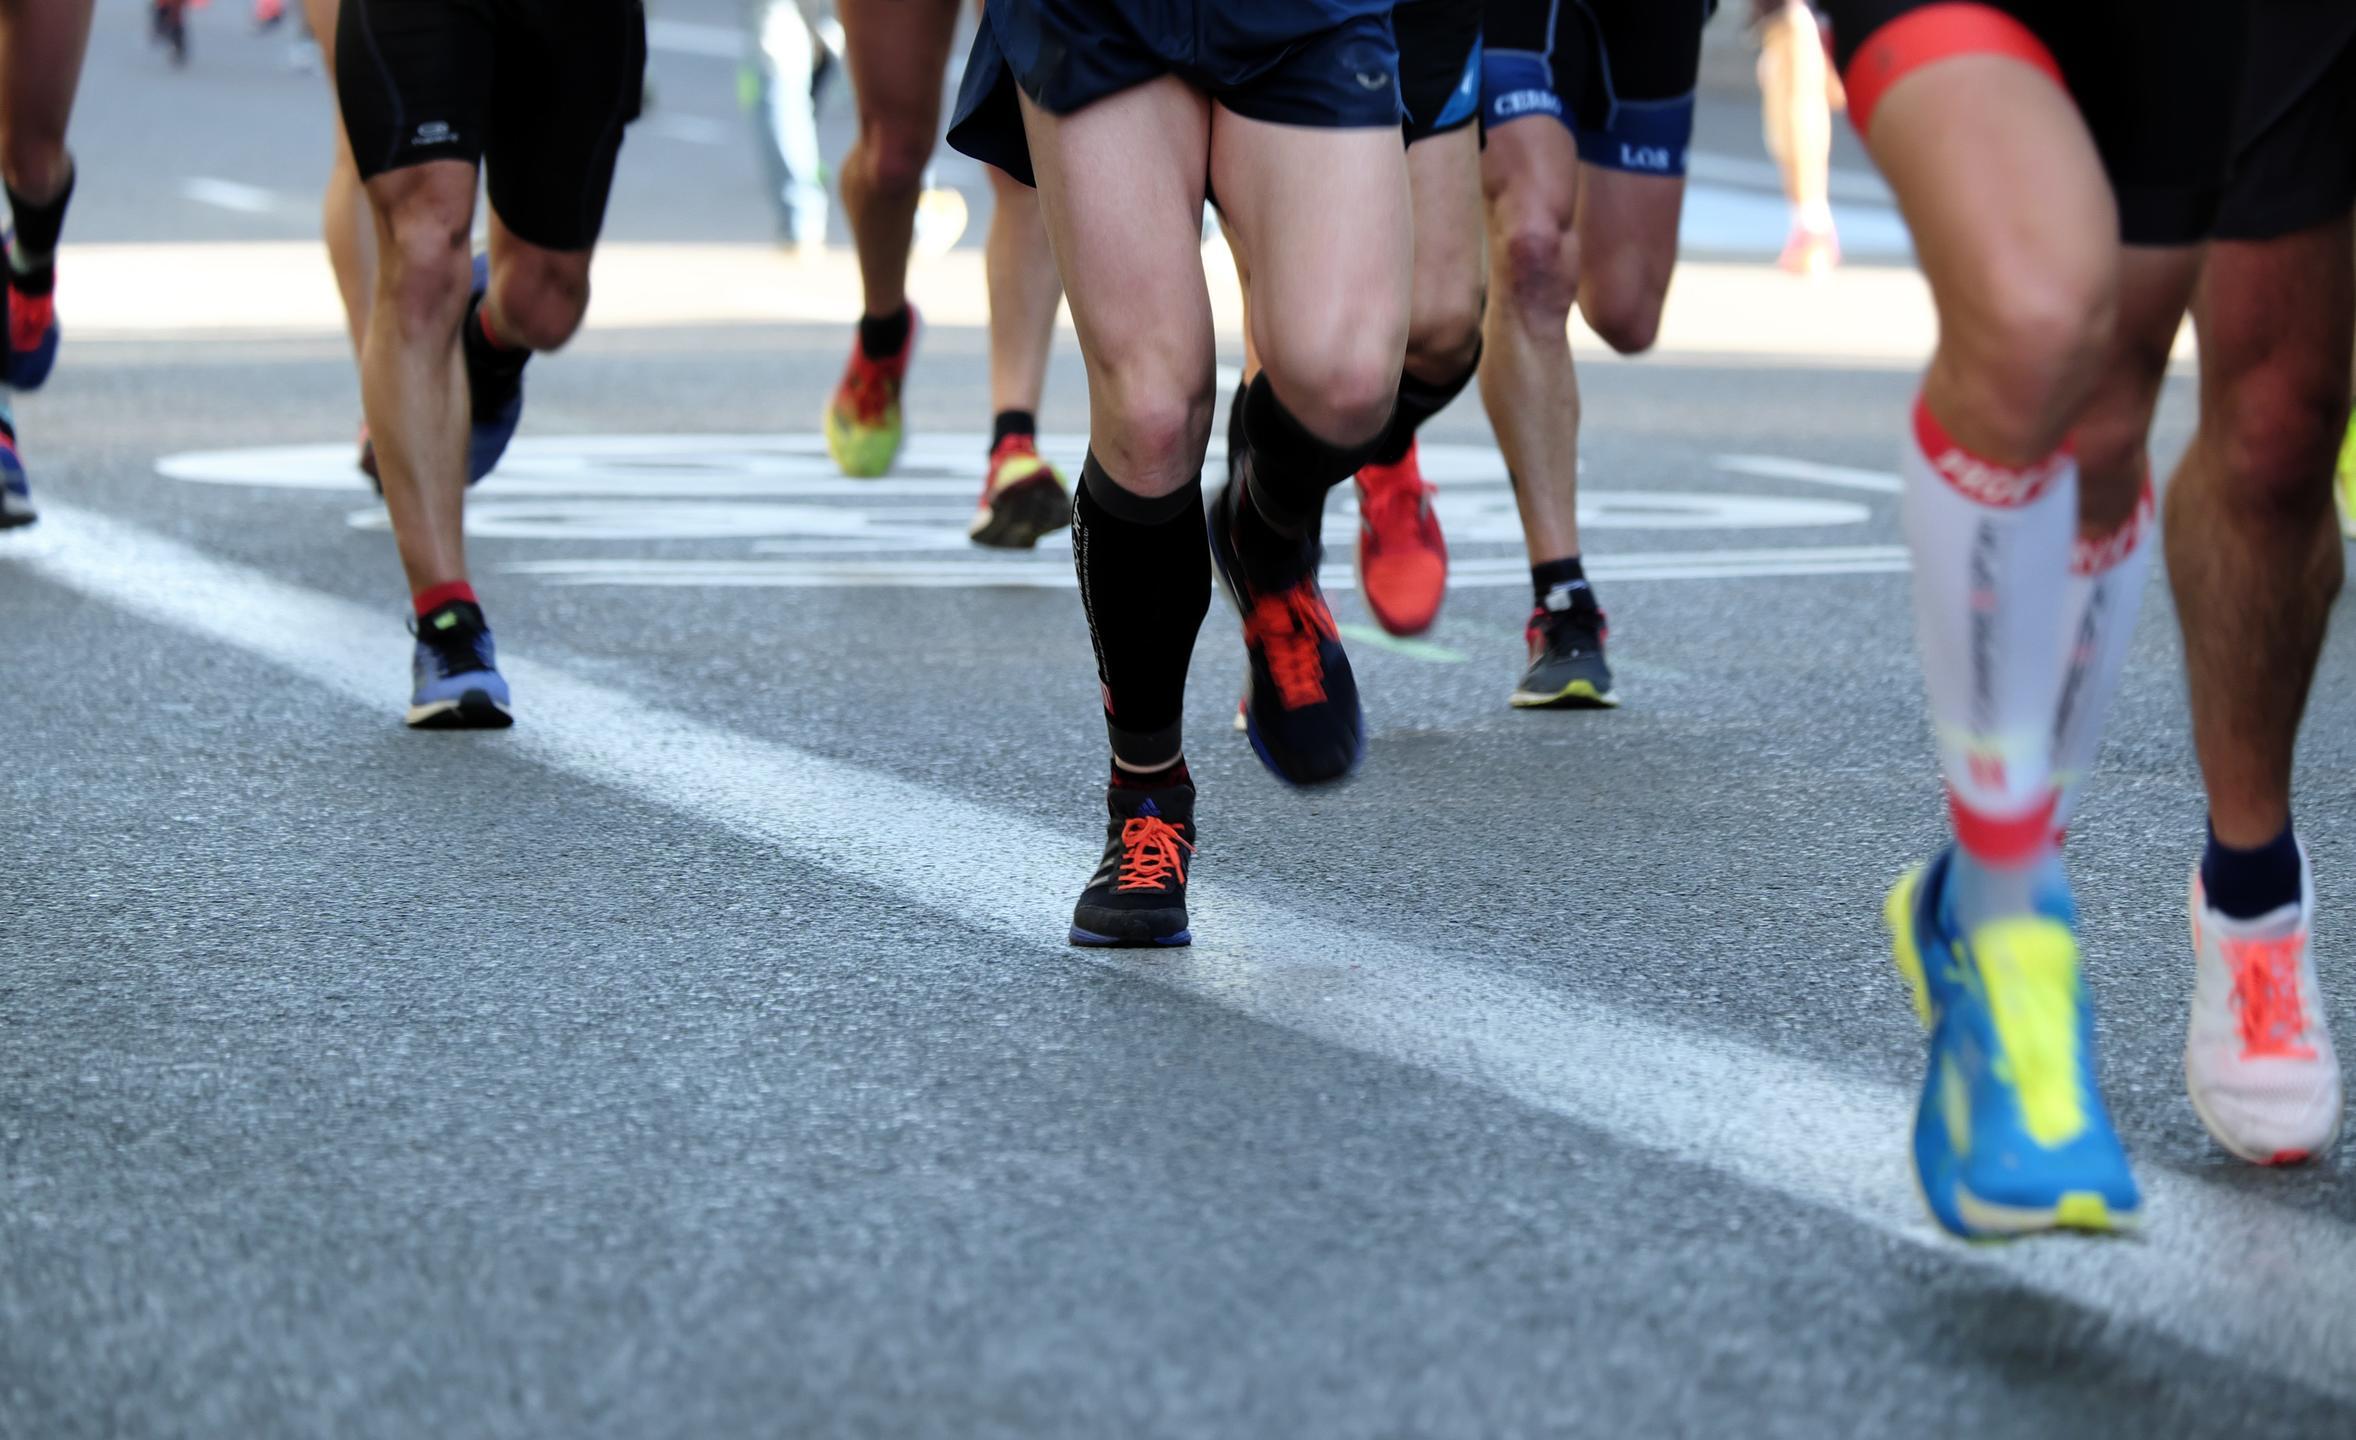 Road race runners